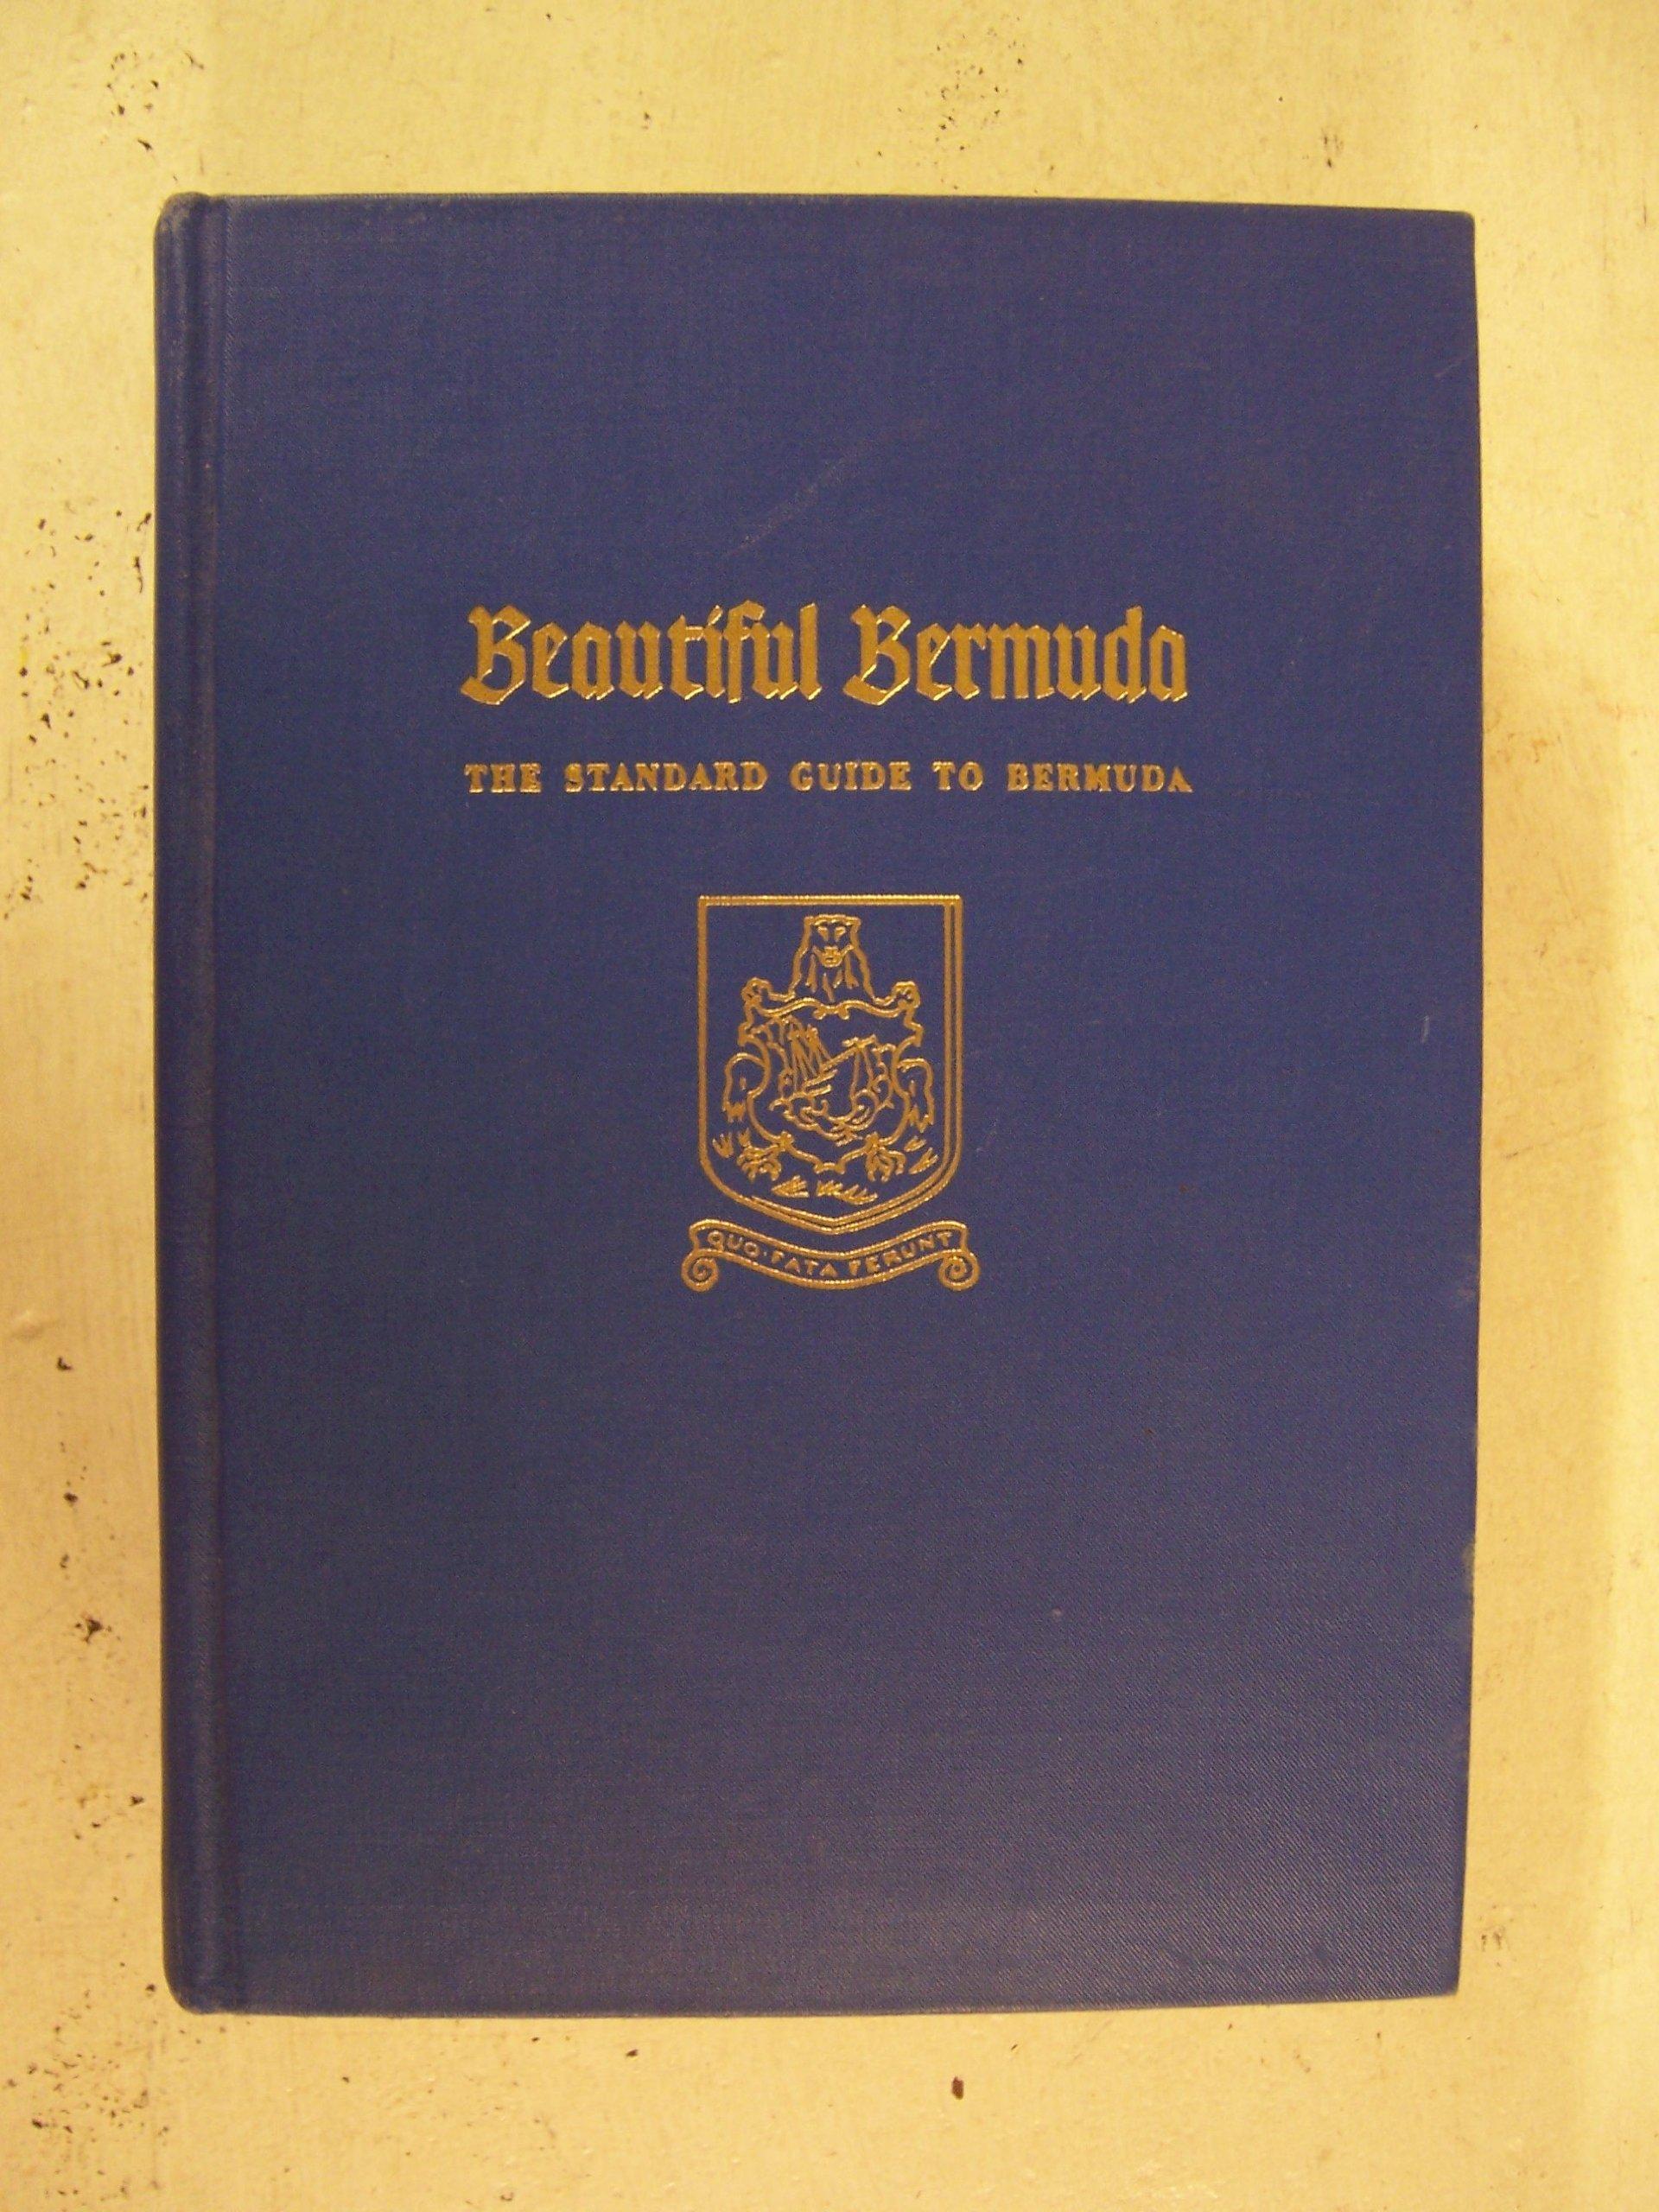 Beautiful Bermuda: The Standard Guide to Bermuda